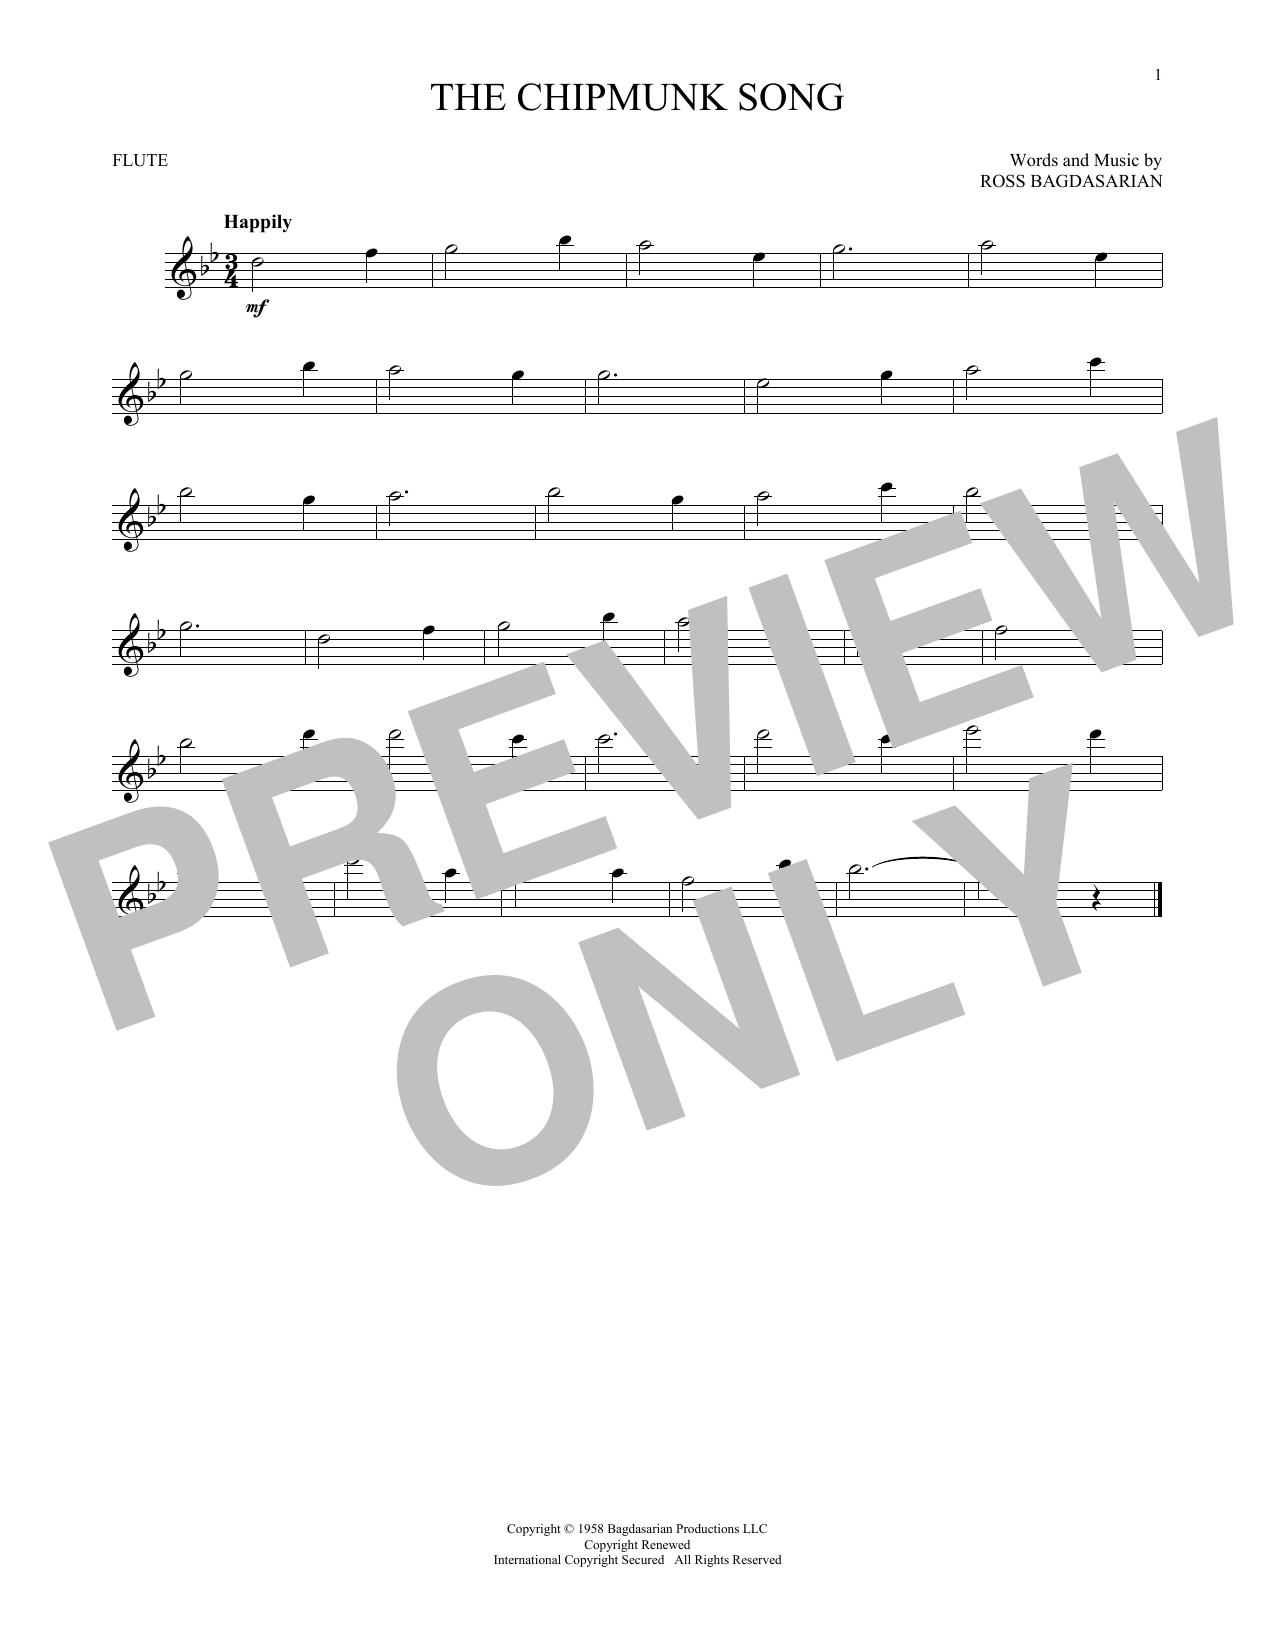 Ross Bagdasarian The Chipmunk Song sheet music notes and chords. Download Printable PDF.